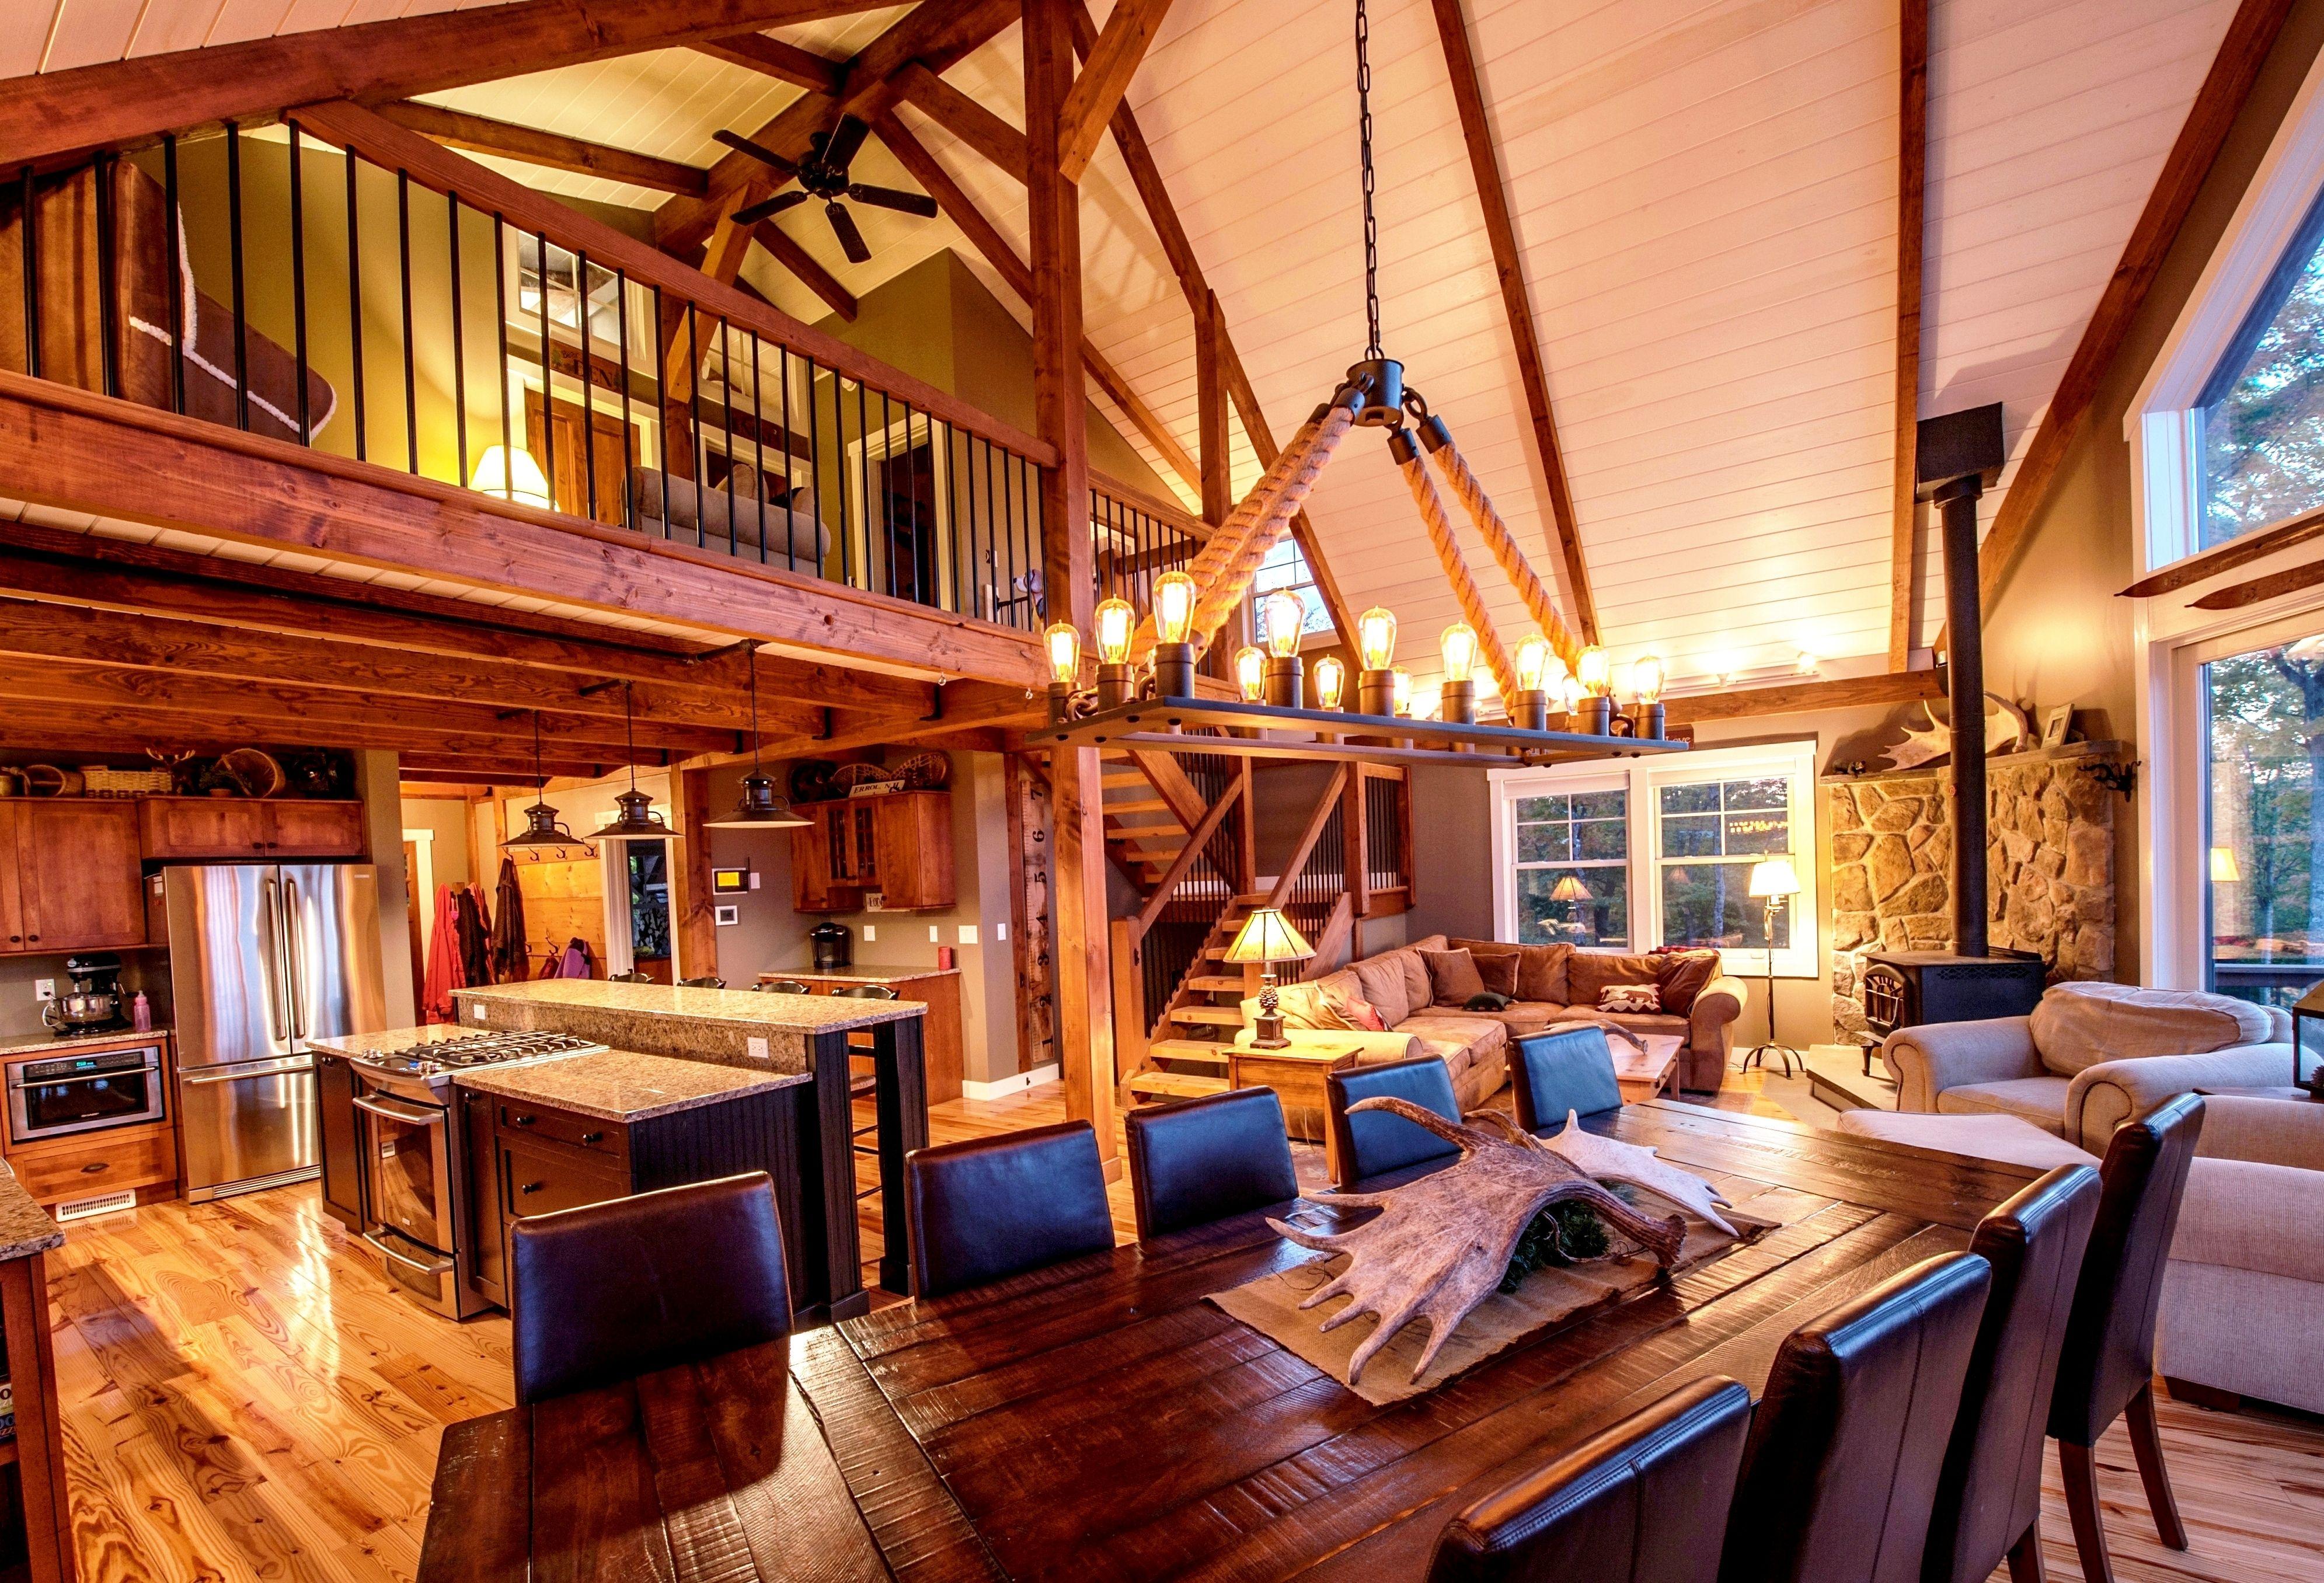 Single Floor Living in a Multilevel Yankee Barn Small